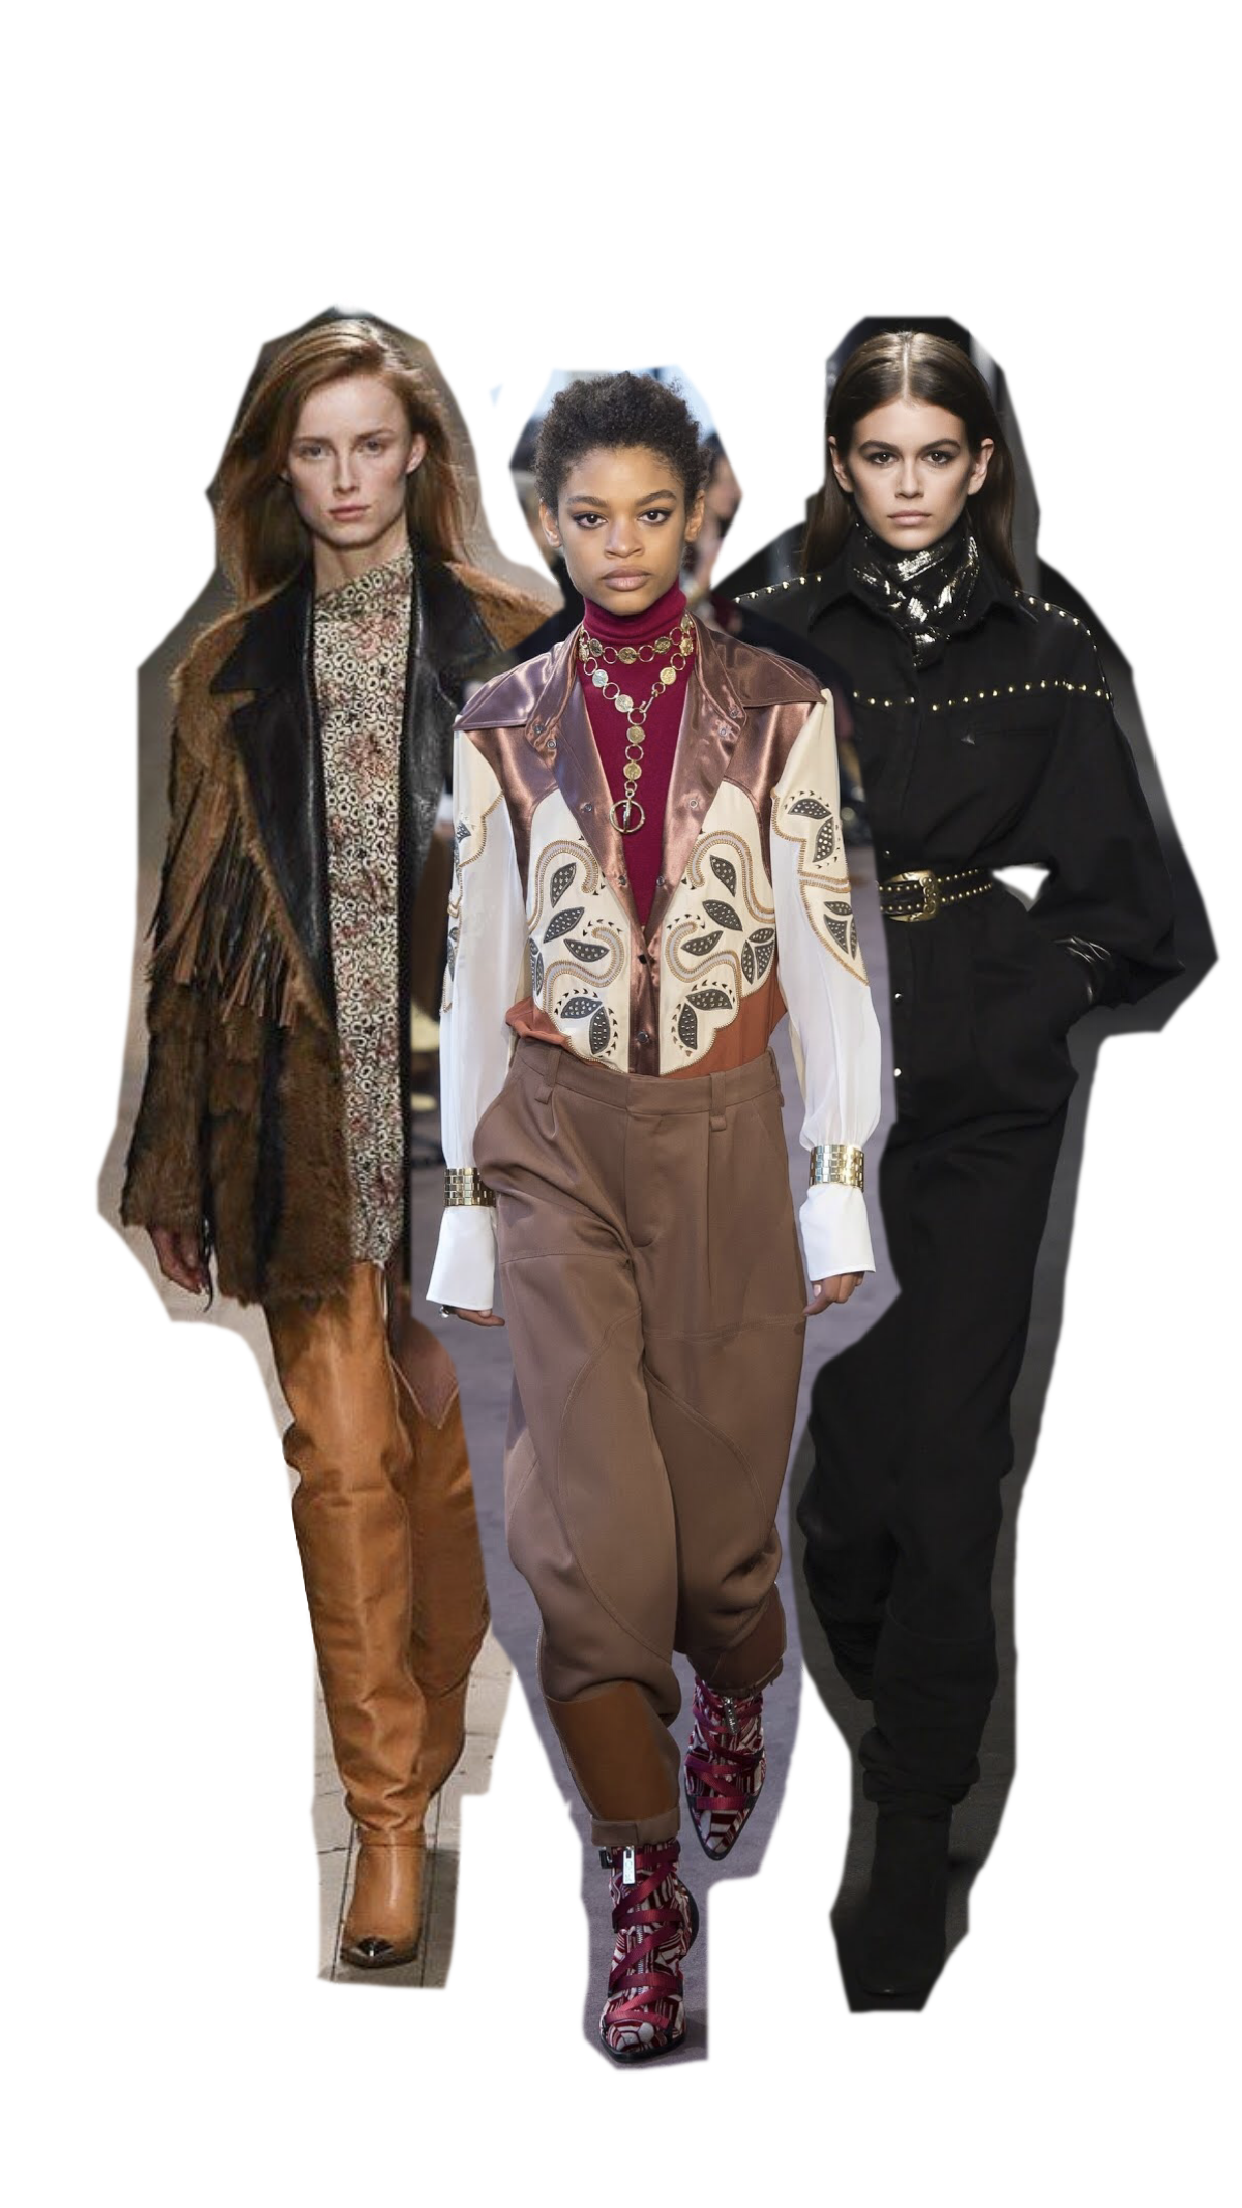 Photos (Left to Right): Isabel Marant, Chloé, Alberta Ferretti